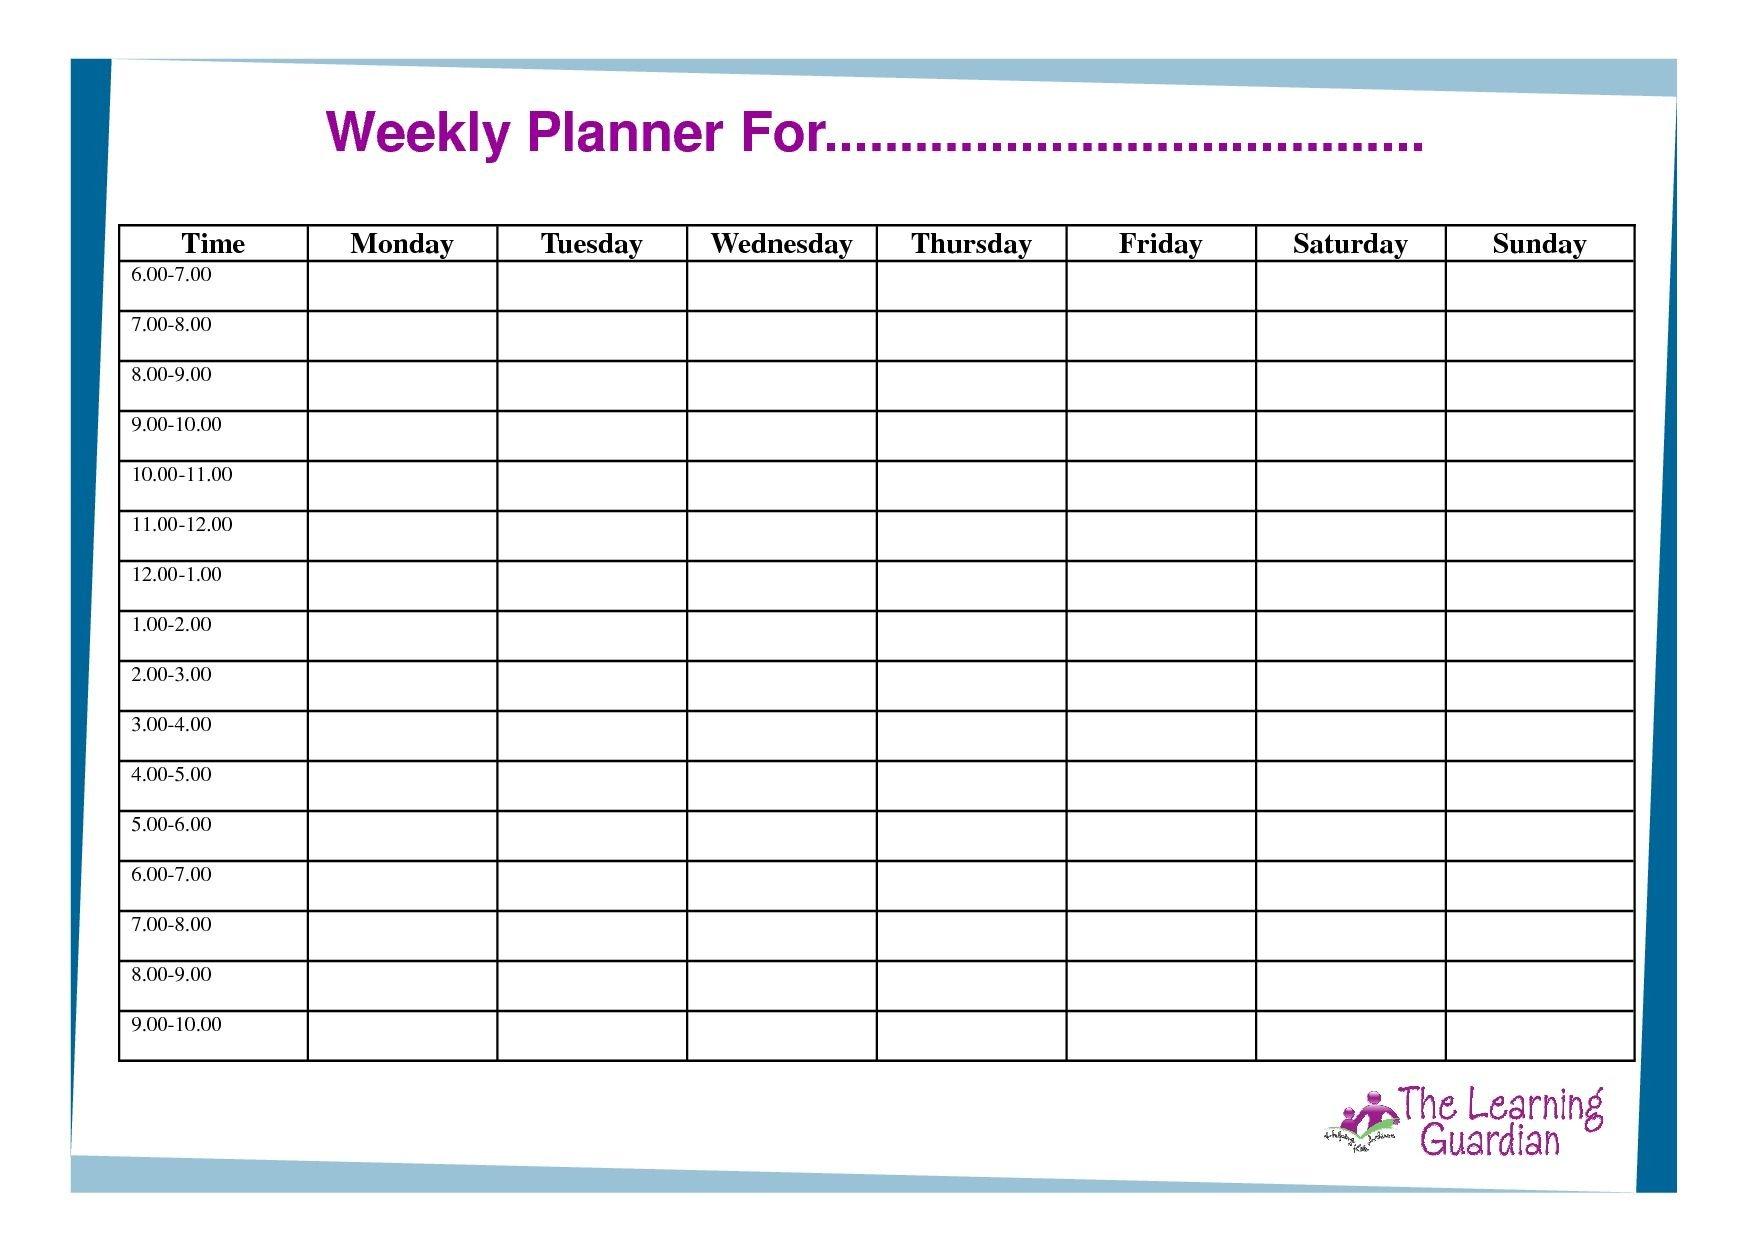 Free Printable Weekly Calendar Templates Weekly Planner Free 7 Day Calendar Template